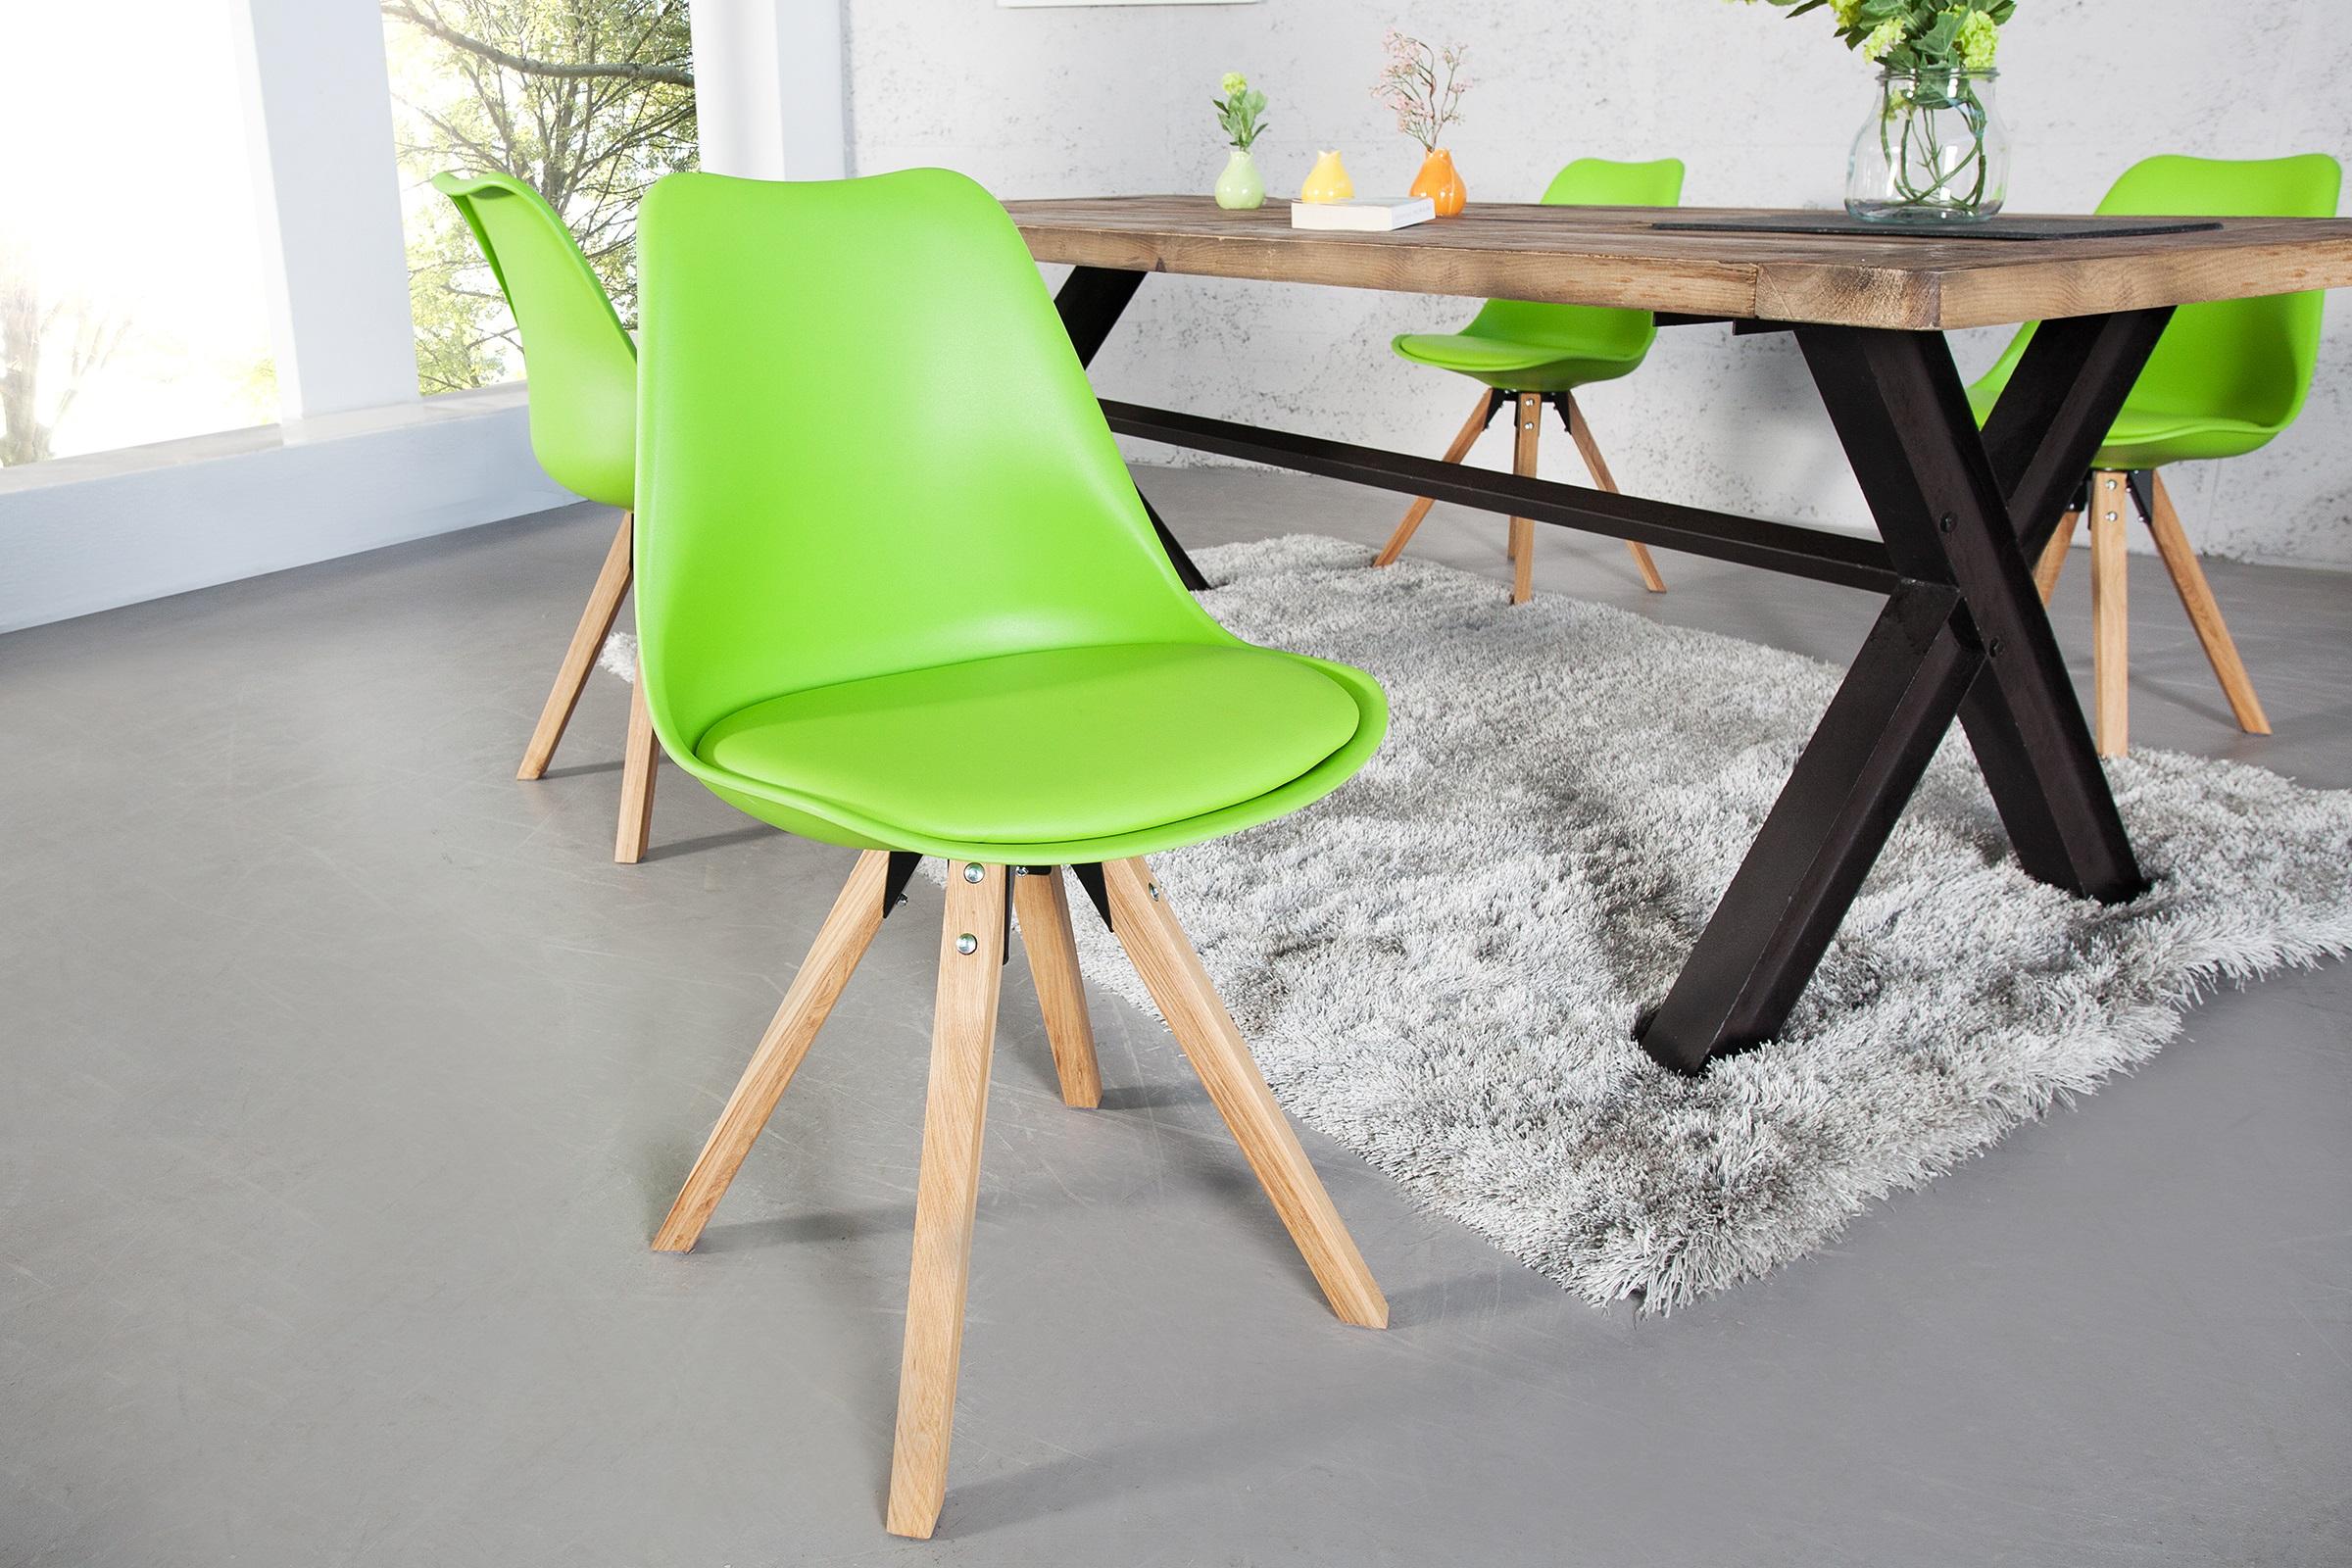 Trendy stoel houten poten lime aktie for Stoel houten poten